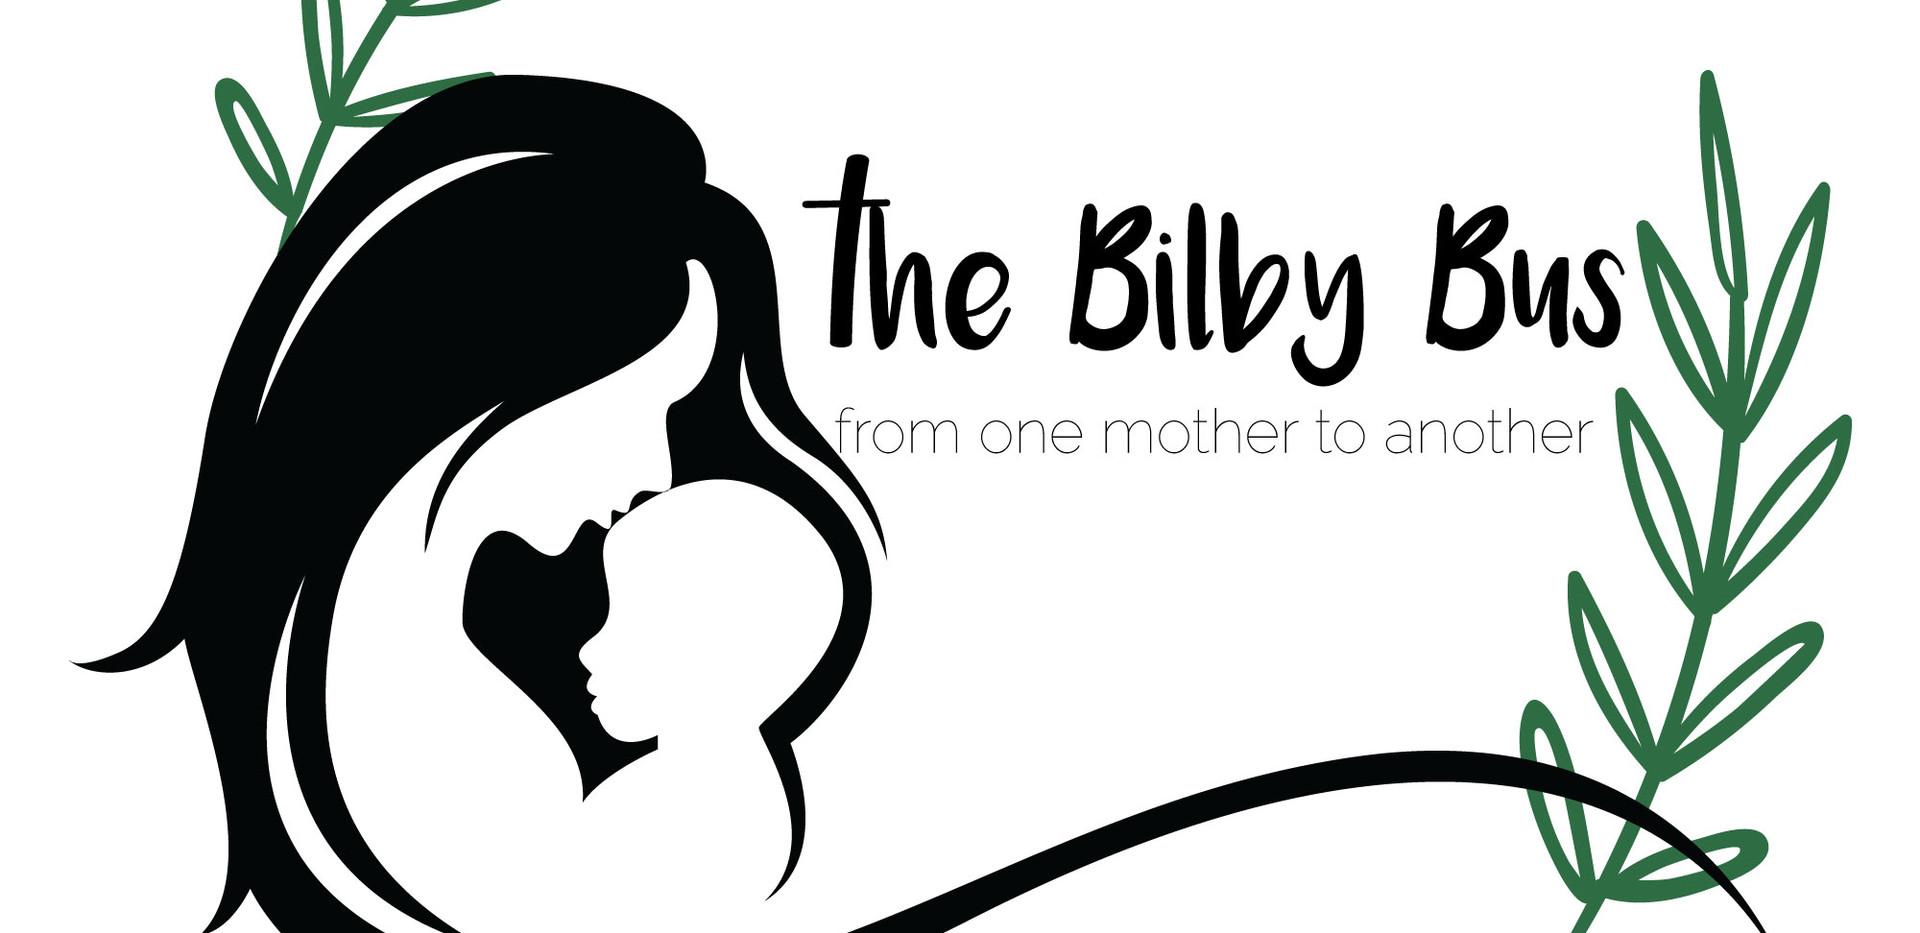 www.onpointwebdesign-Bilby-Bus-Logo-jpg.